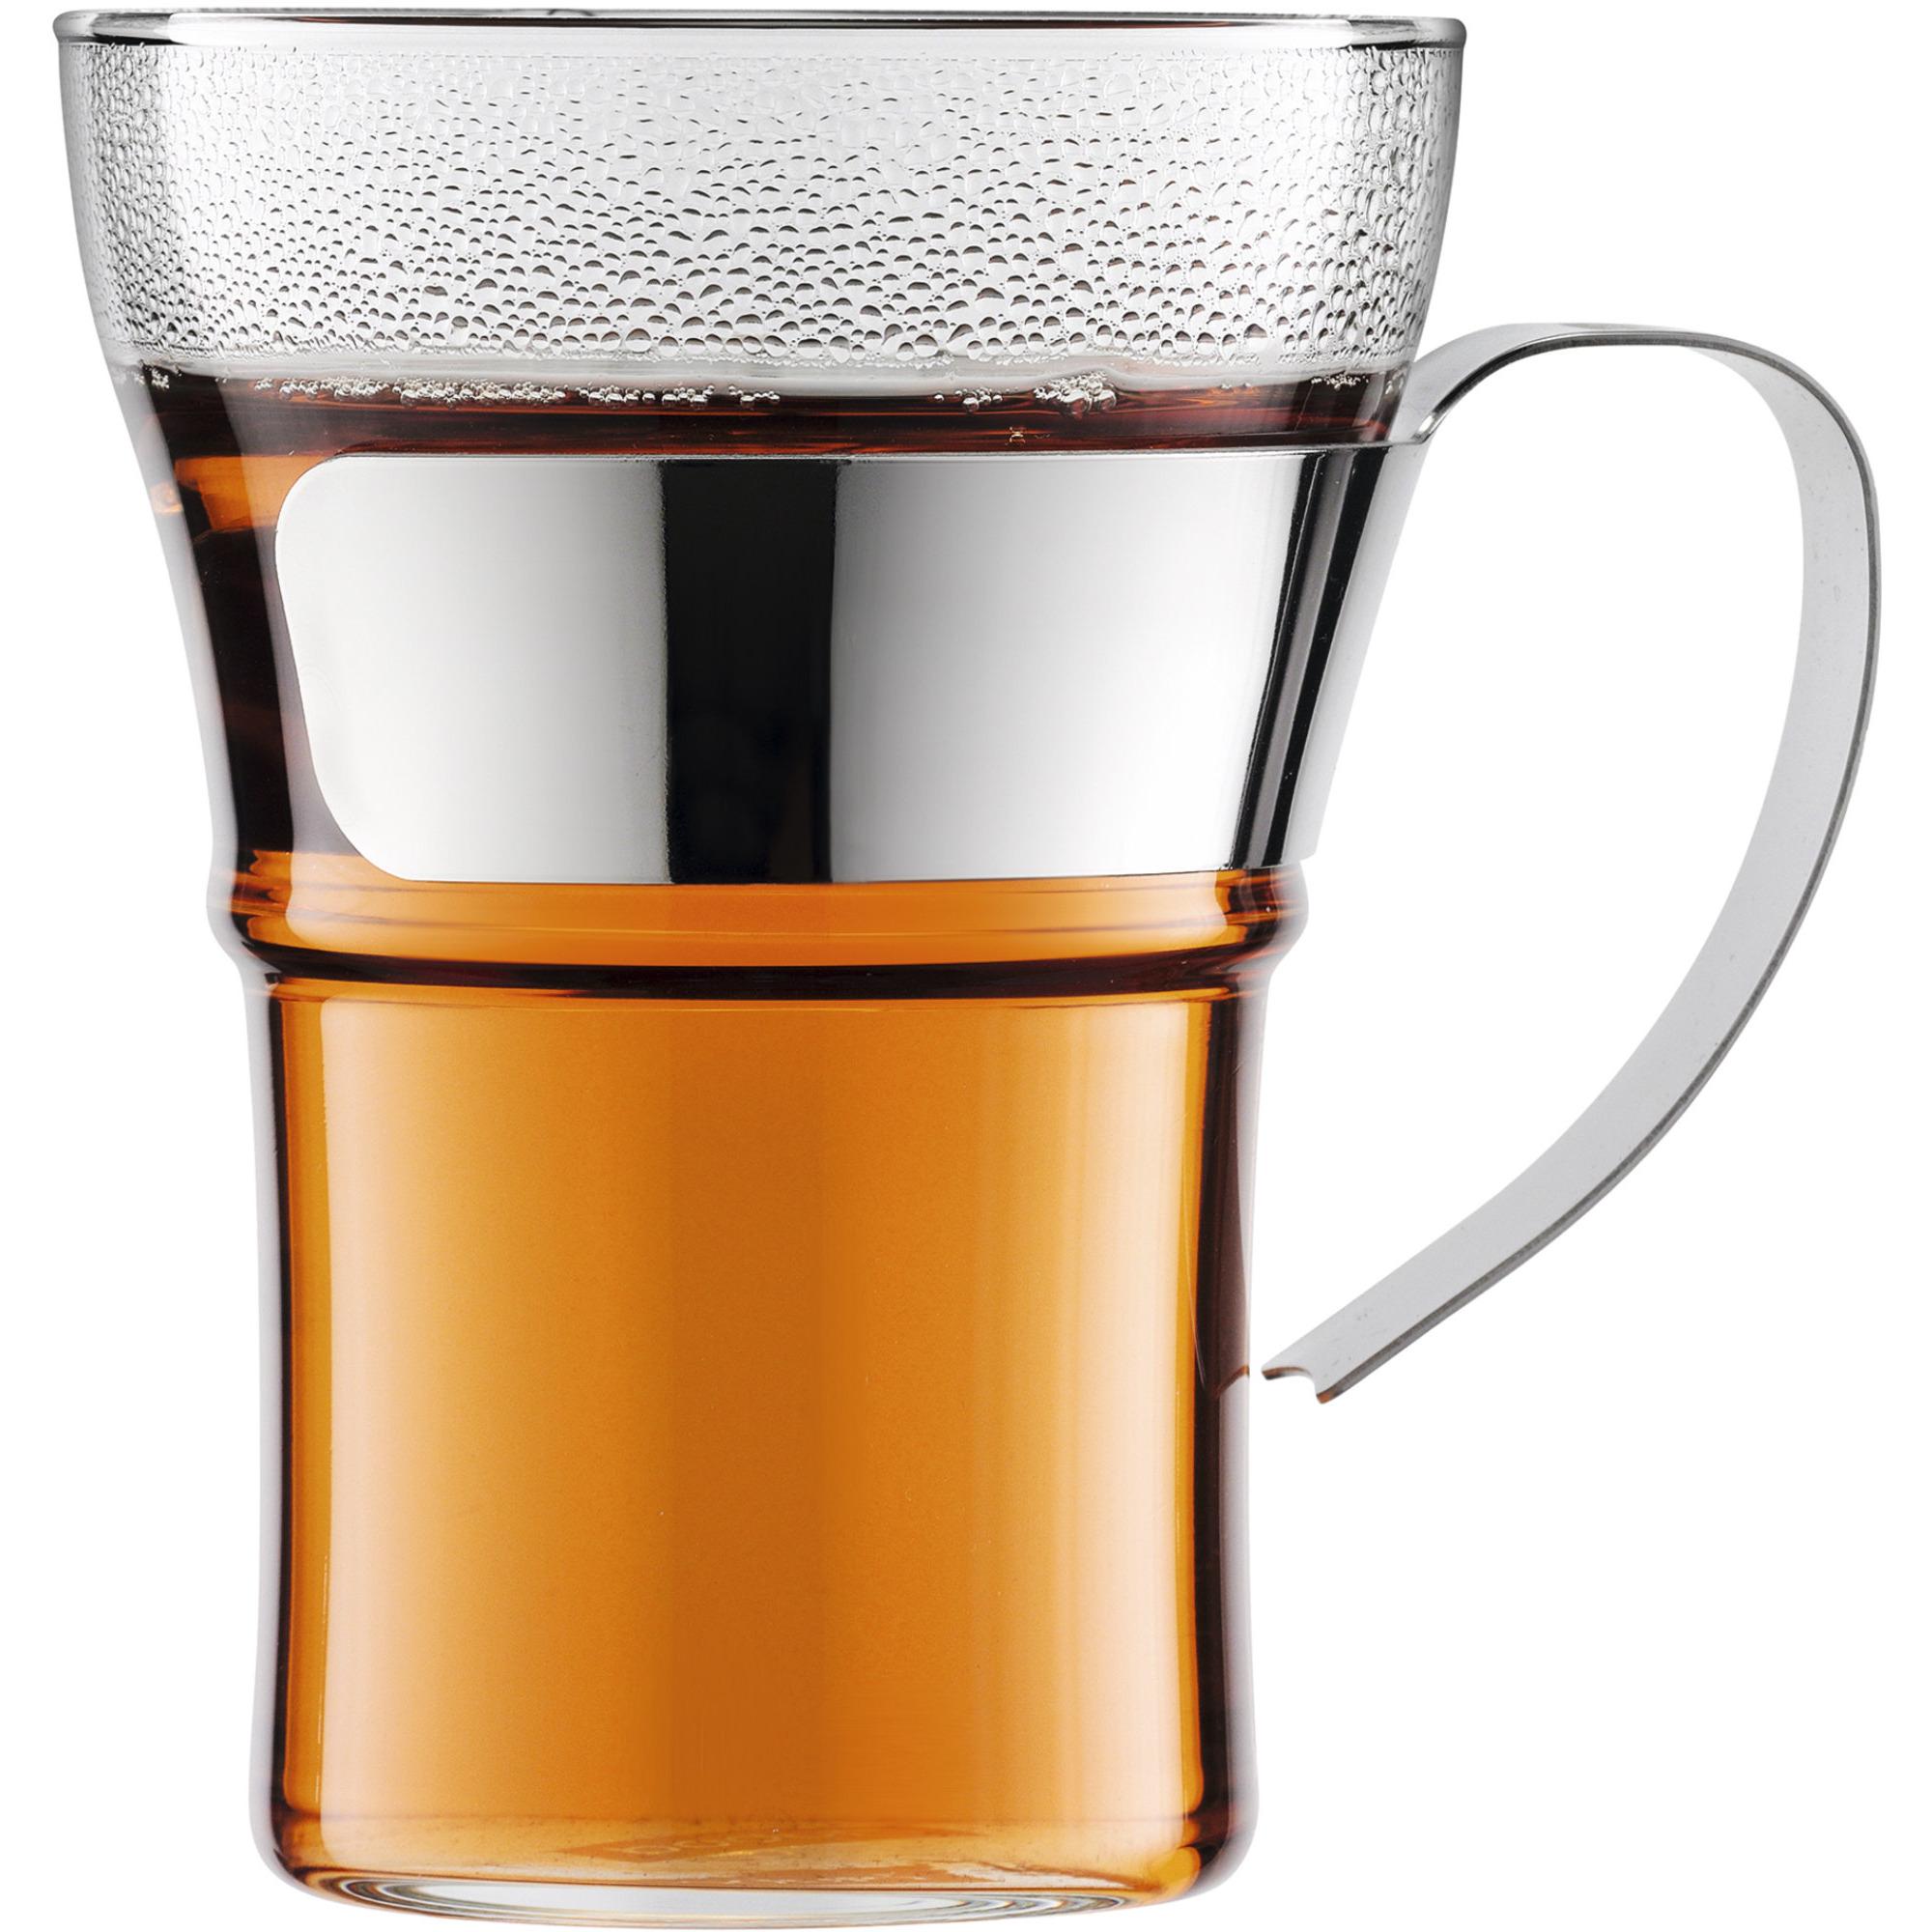 Bodum ASSAM Kaffeglas med krom handtag 2 st. – 035 l